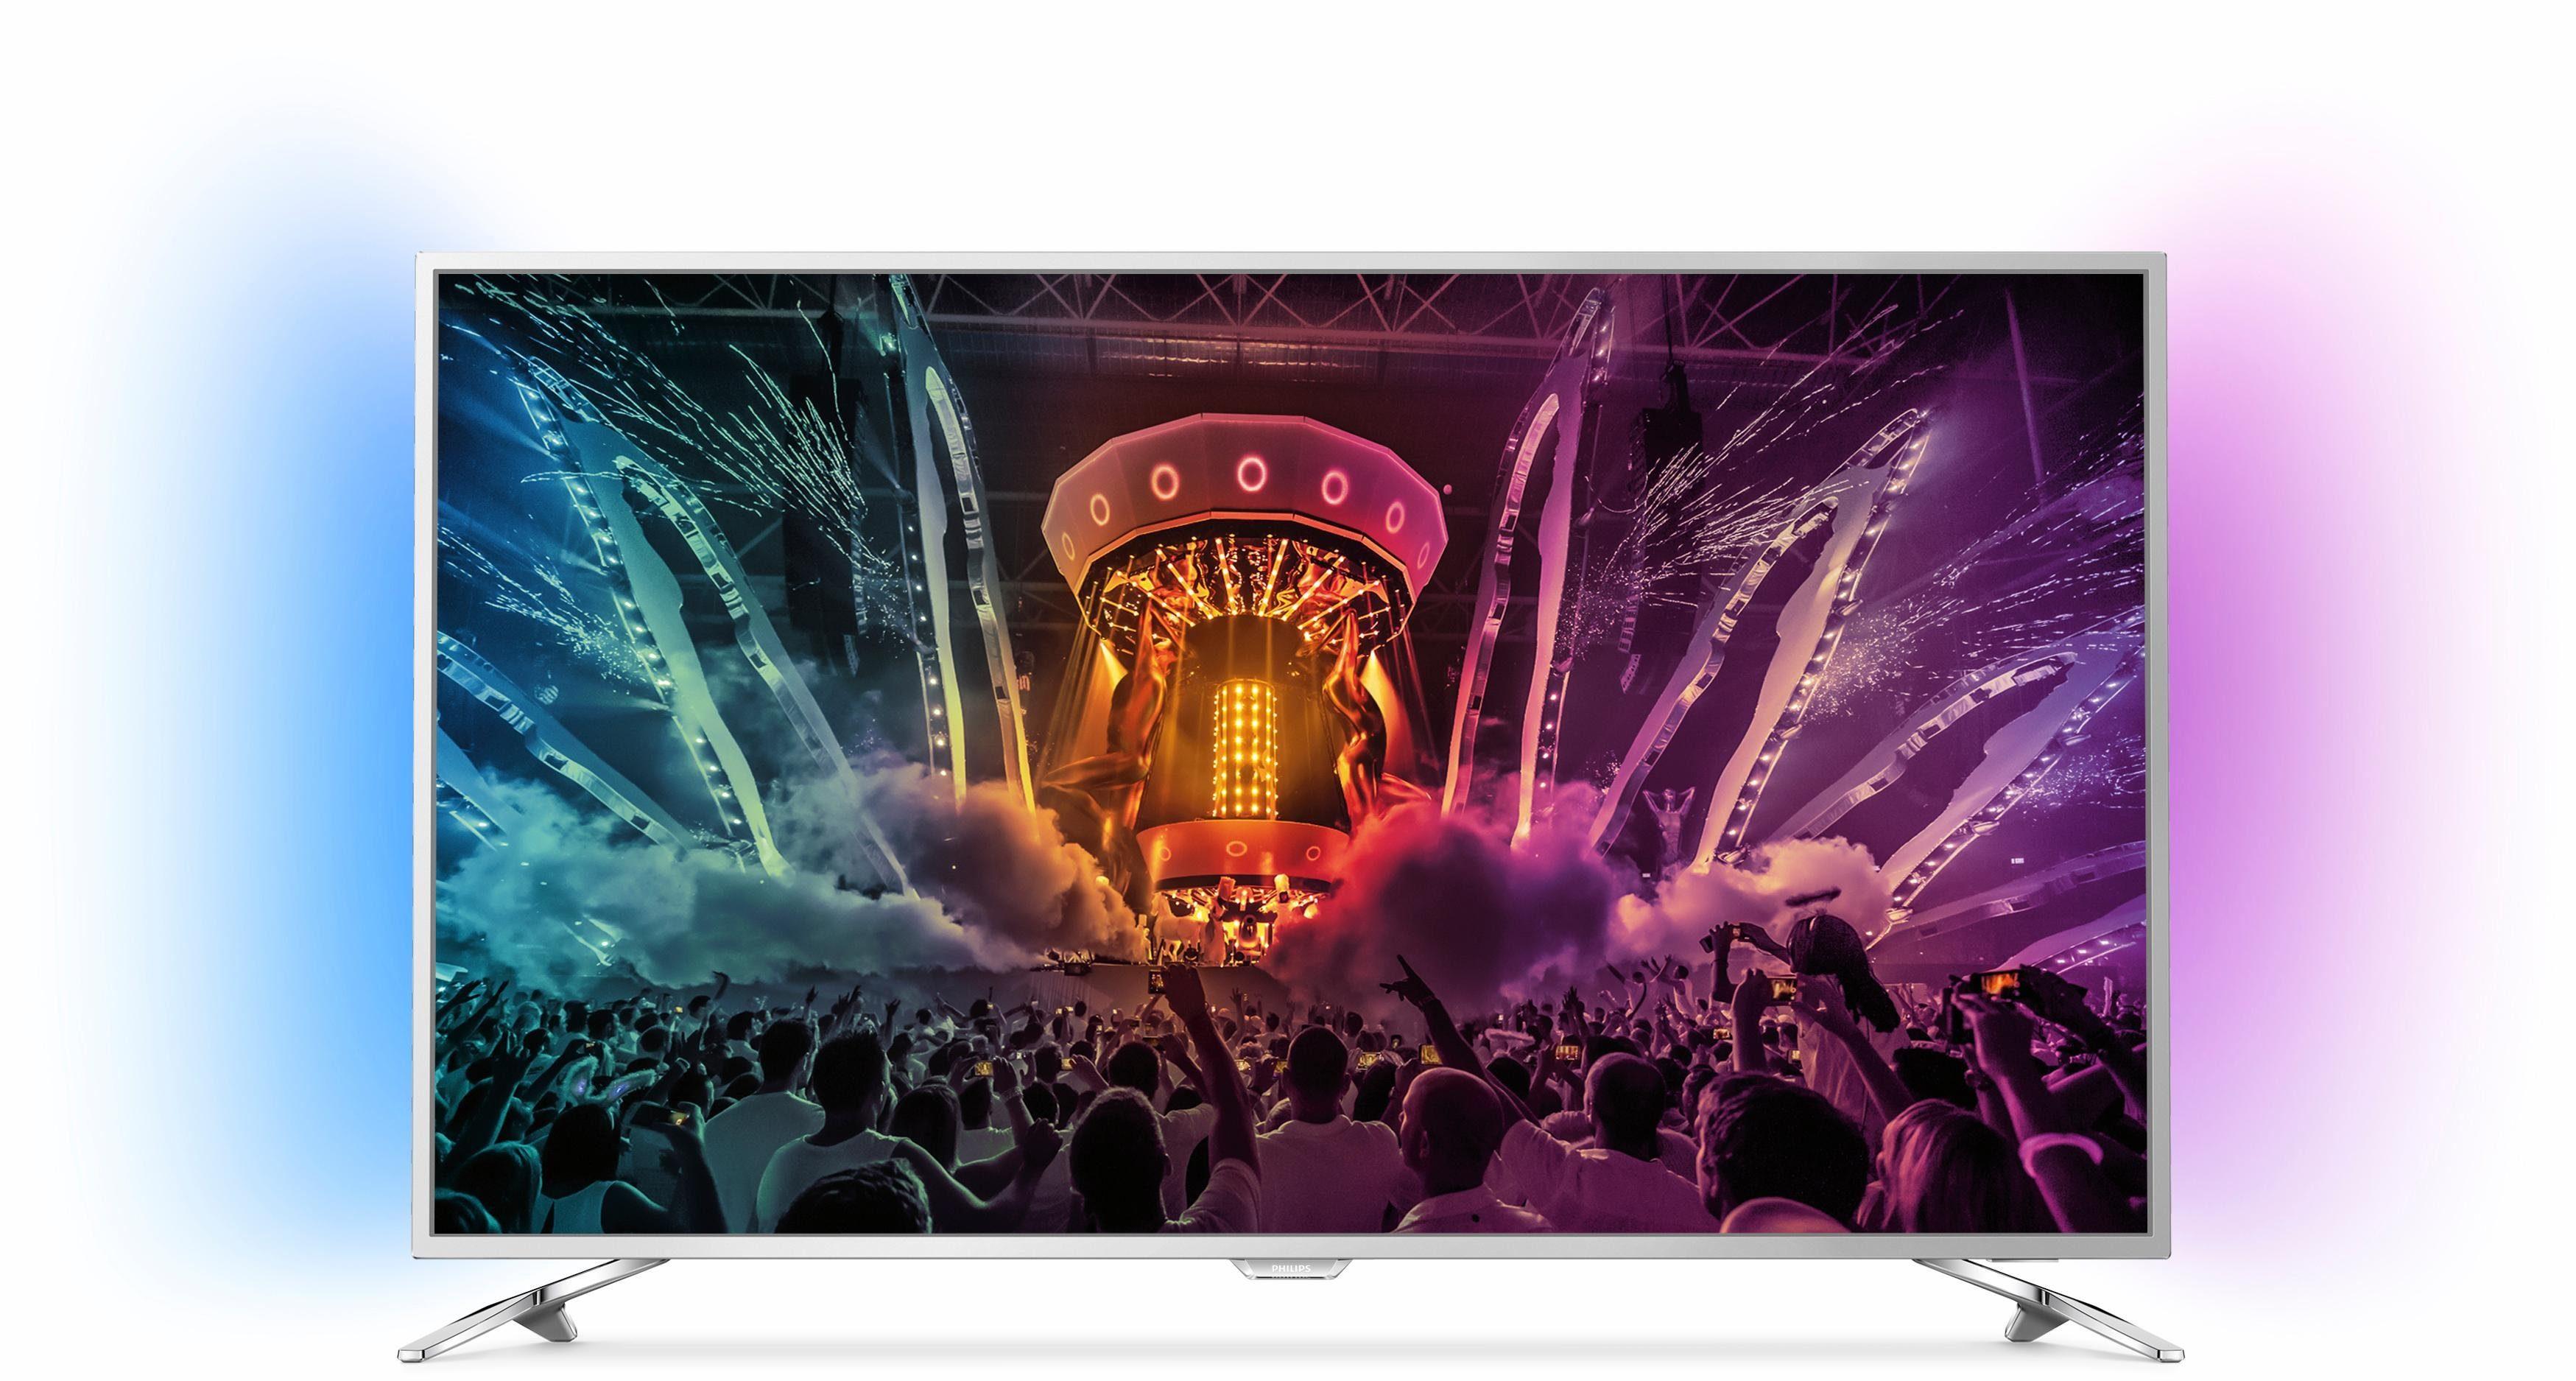 Philips 43PUS6501/12, LED Fernseher, 108 cm (43 Zoll), 2160p (4K Ultra HD) Ambilight, Smart-TV